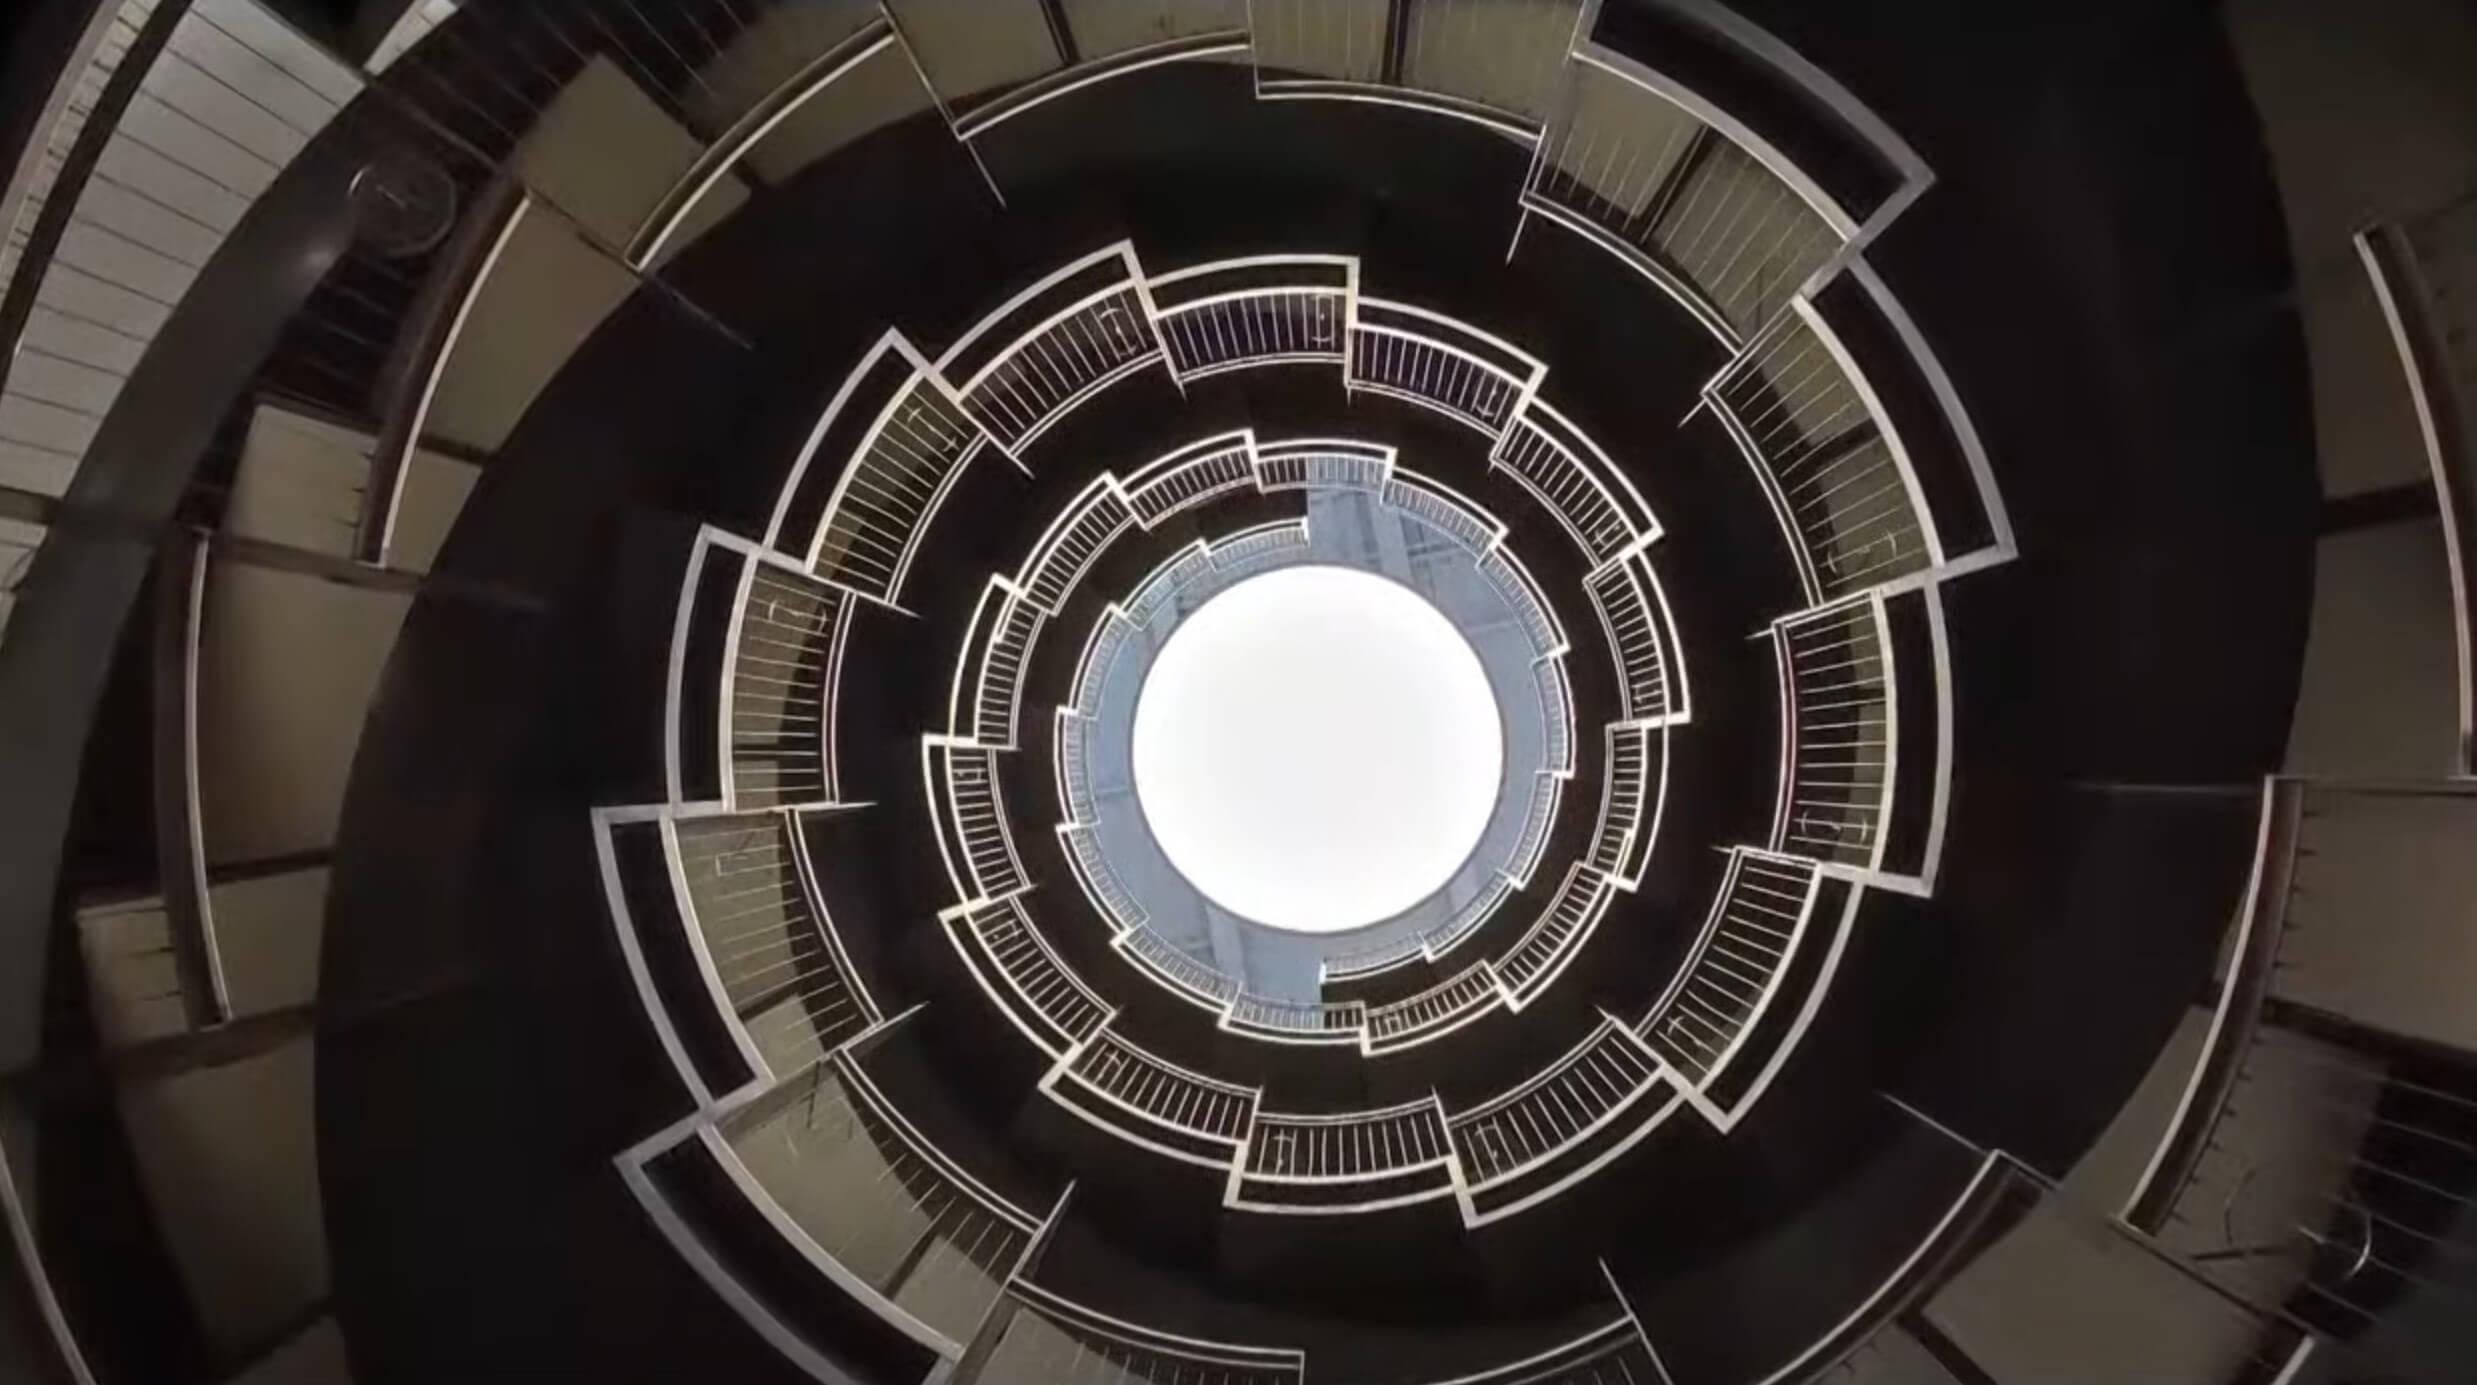 Xiaomi POCO X3 Proの超広角カメラで撮影した画像